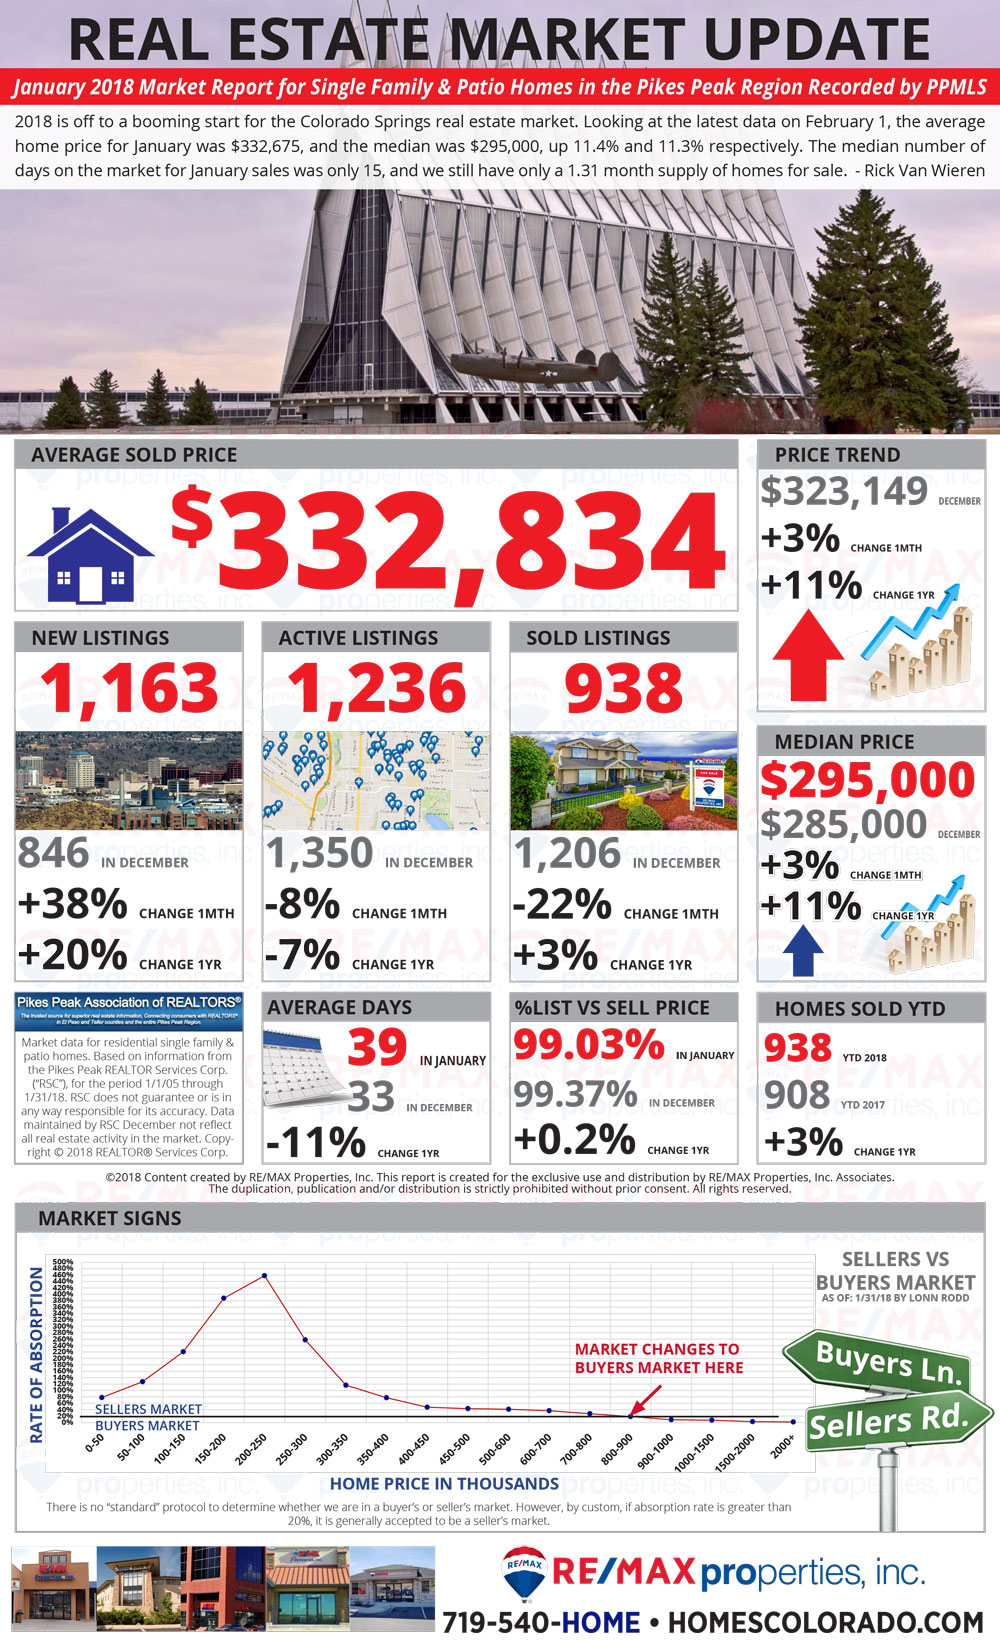 January 2018 Market Update - Colorado Springs Real Estate - Colorado Springs Homes For Sale